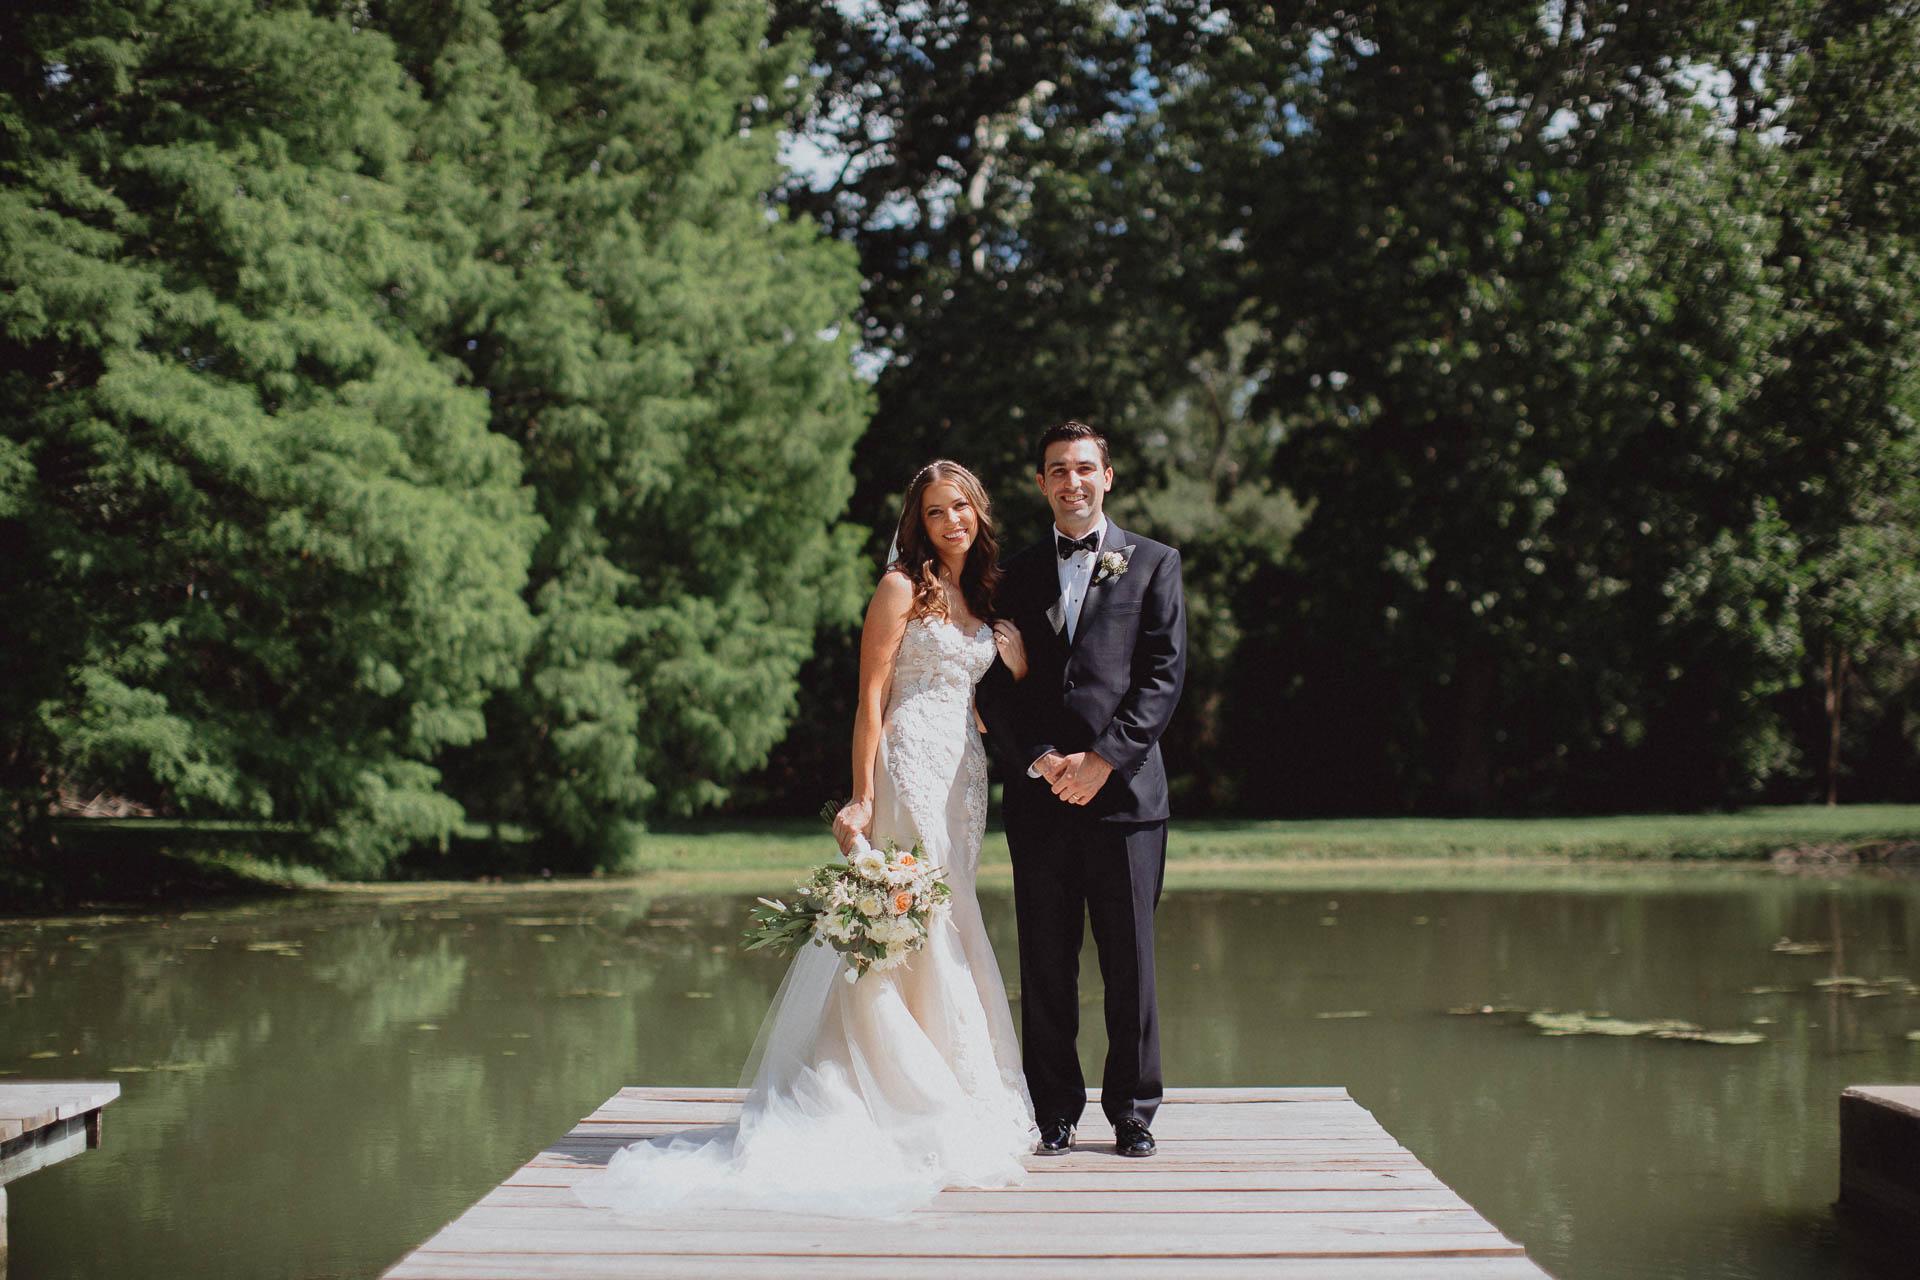 Keri-Joseph-Top-of-the-Market-Wedding-102@2x.jpg